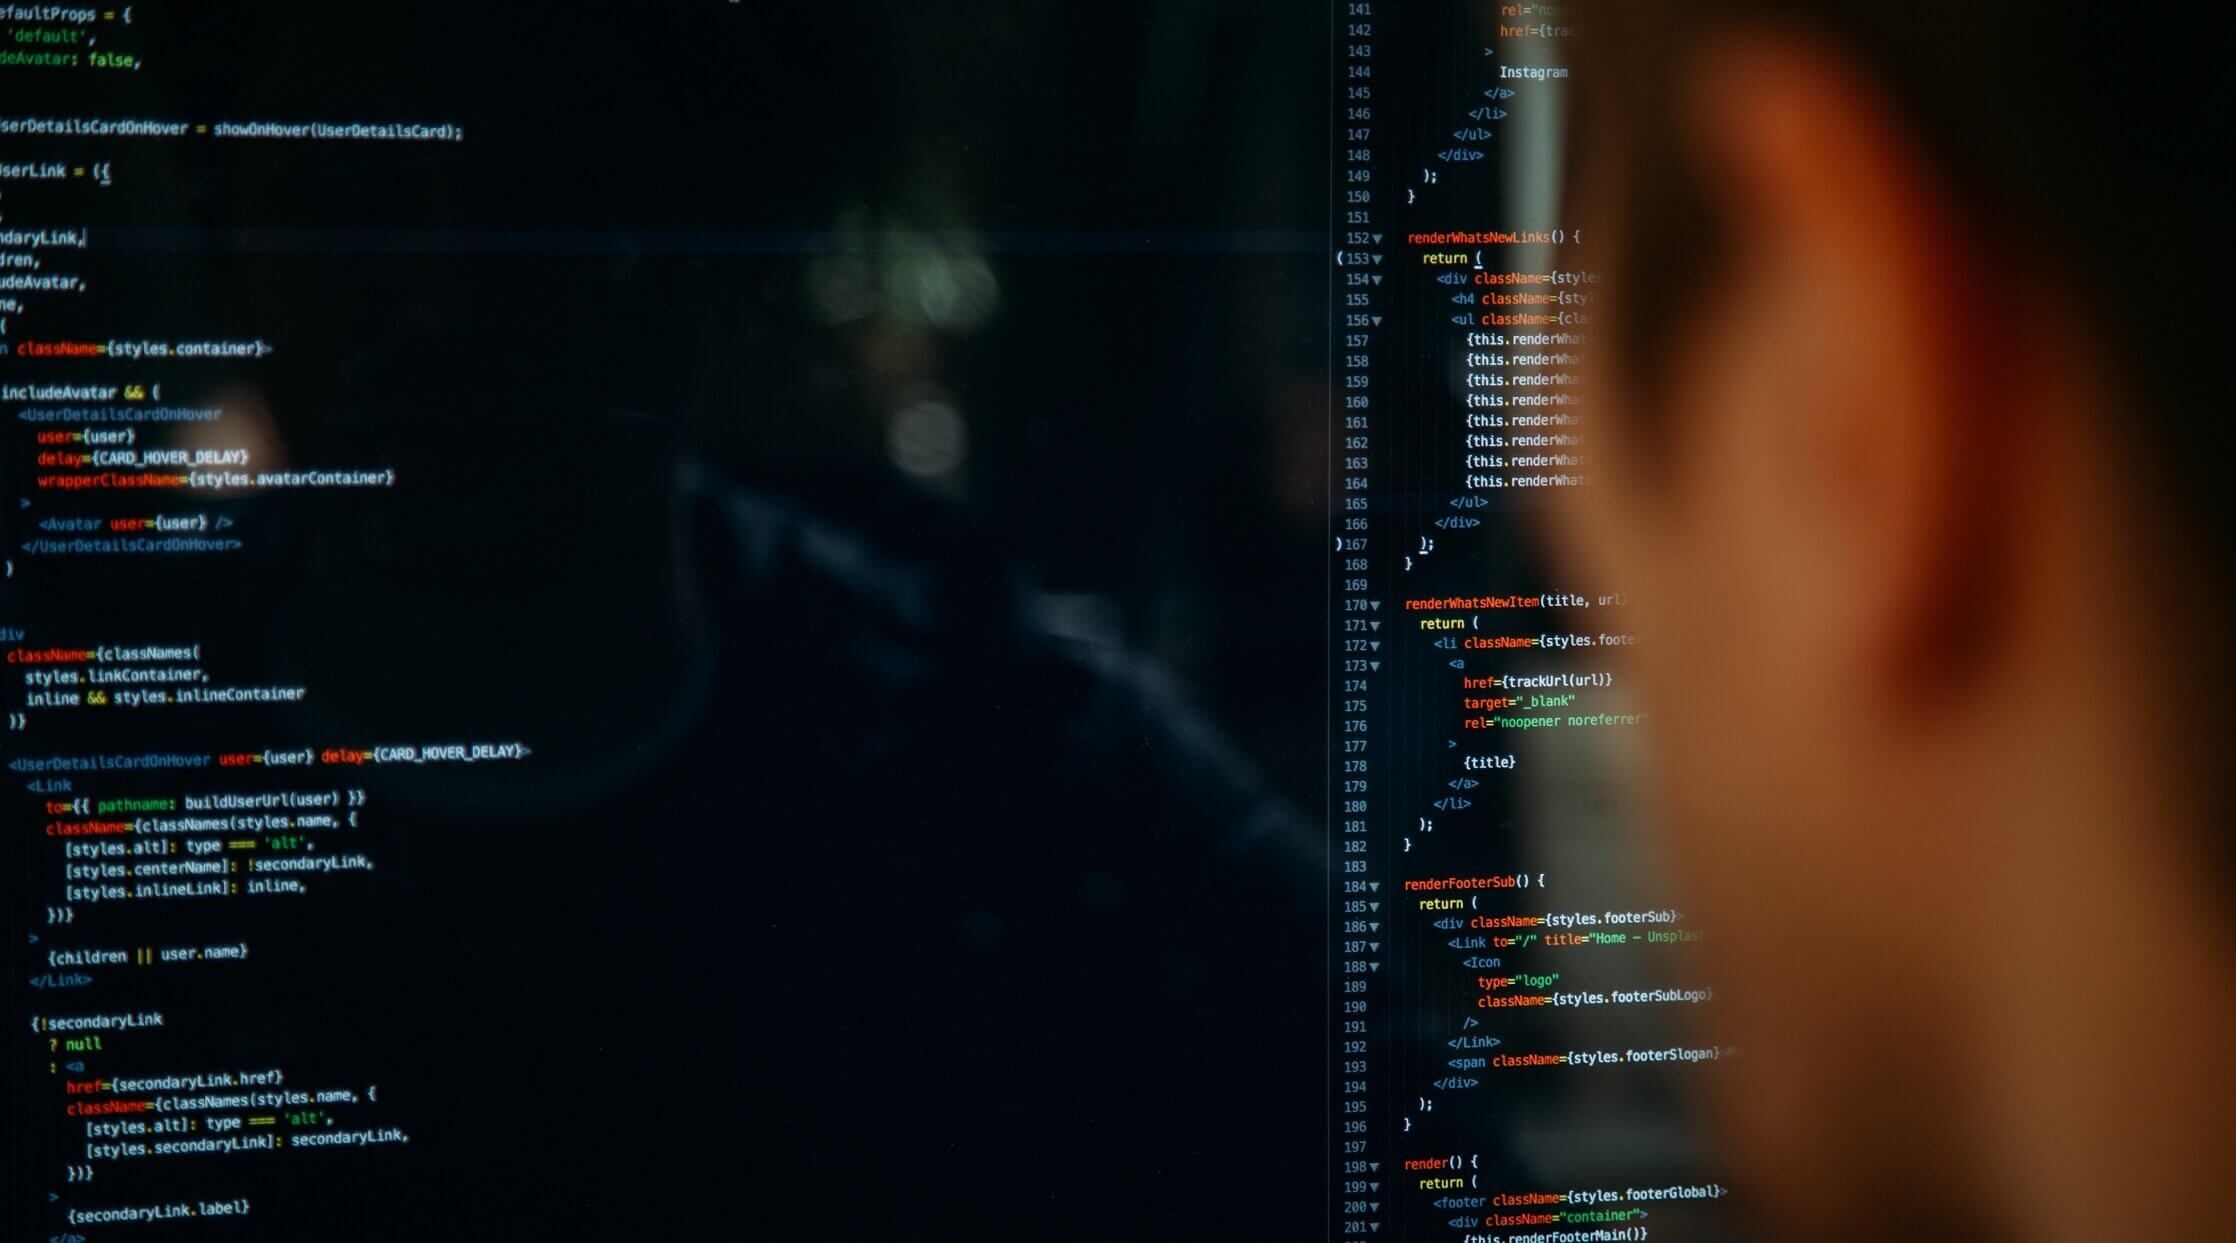 Artificial neural network python code